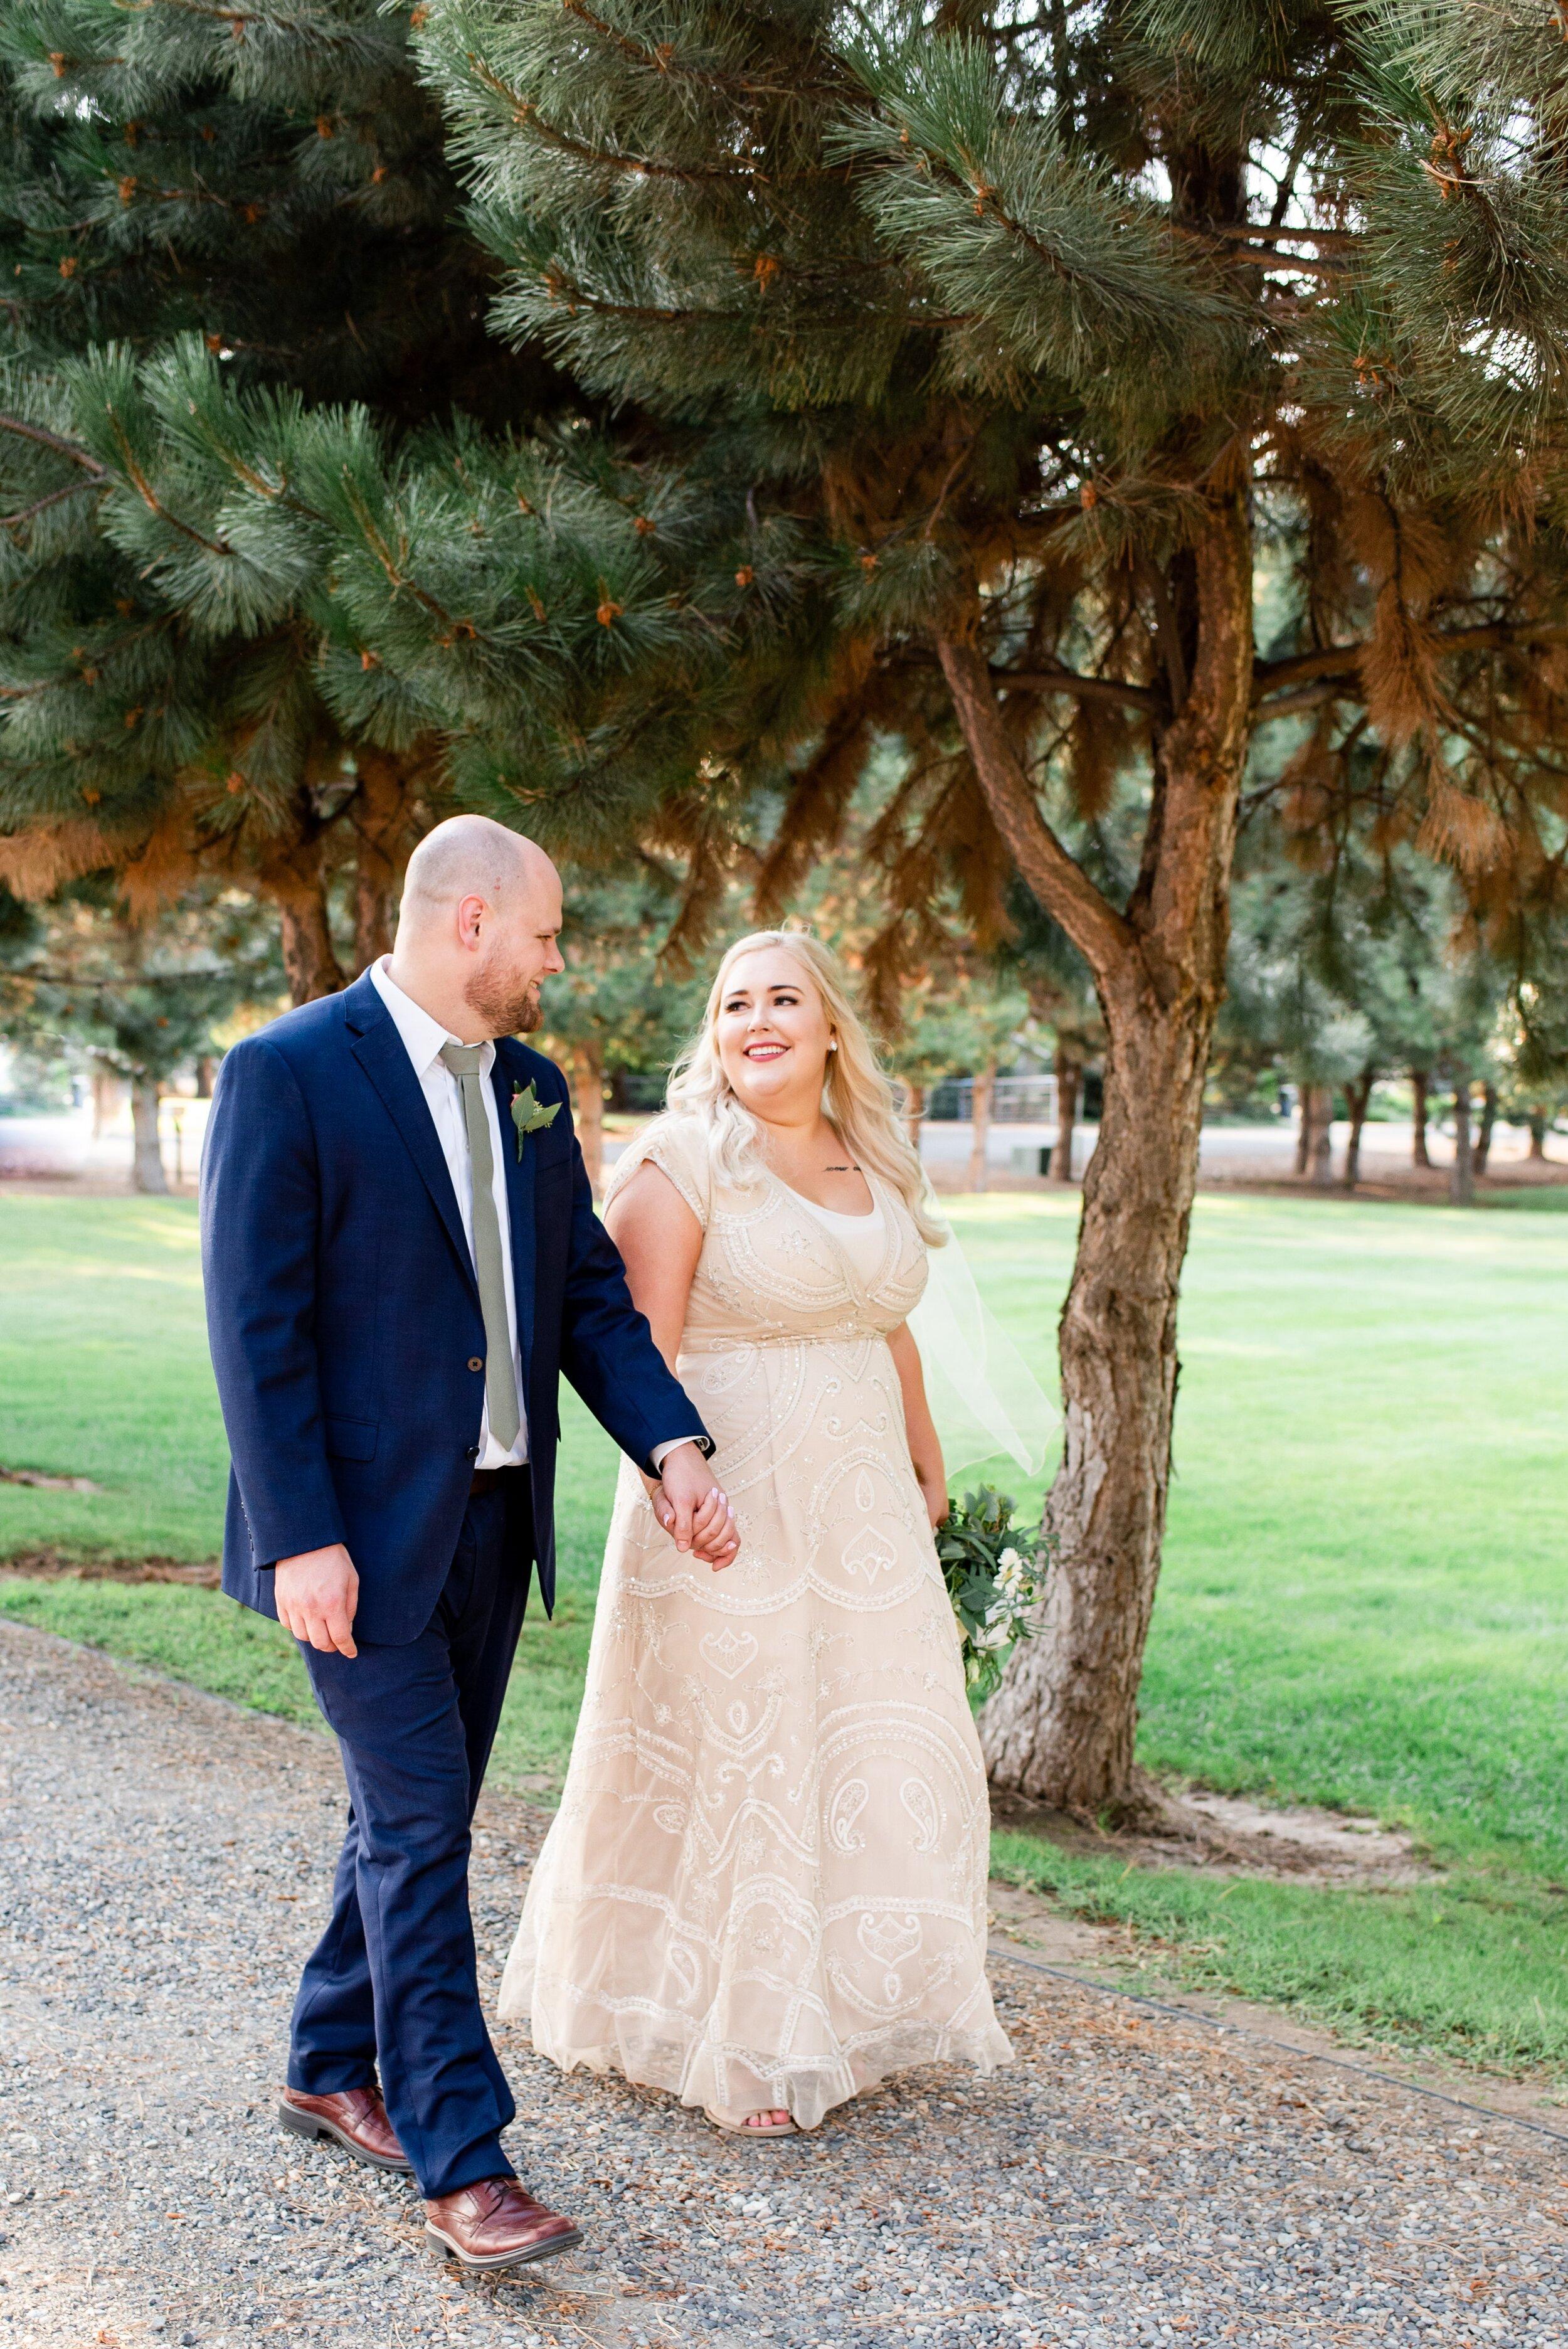 Bride & Groom Portraits- Tri Cities Wedding Photographer - Morgan Tayler Photo & Design - Tri Cities Washington Backyard Wedding